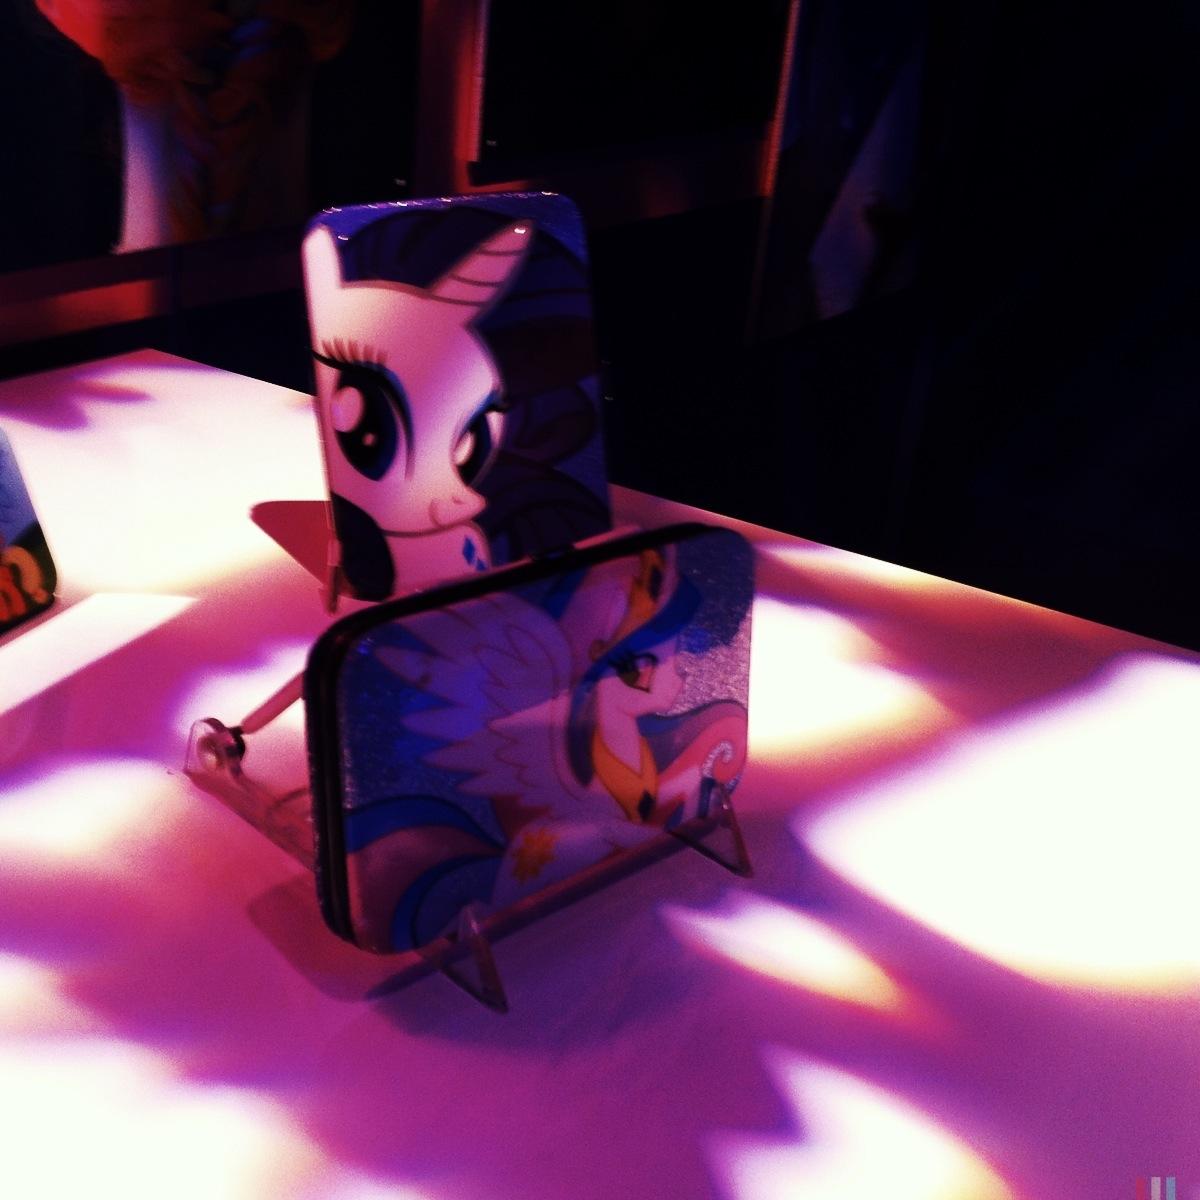 201-toyfair-hasbro7.JPG